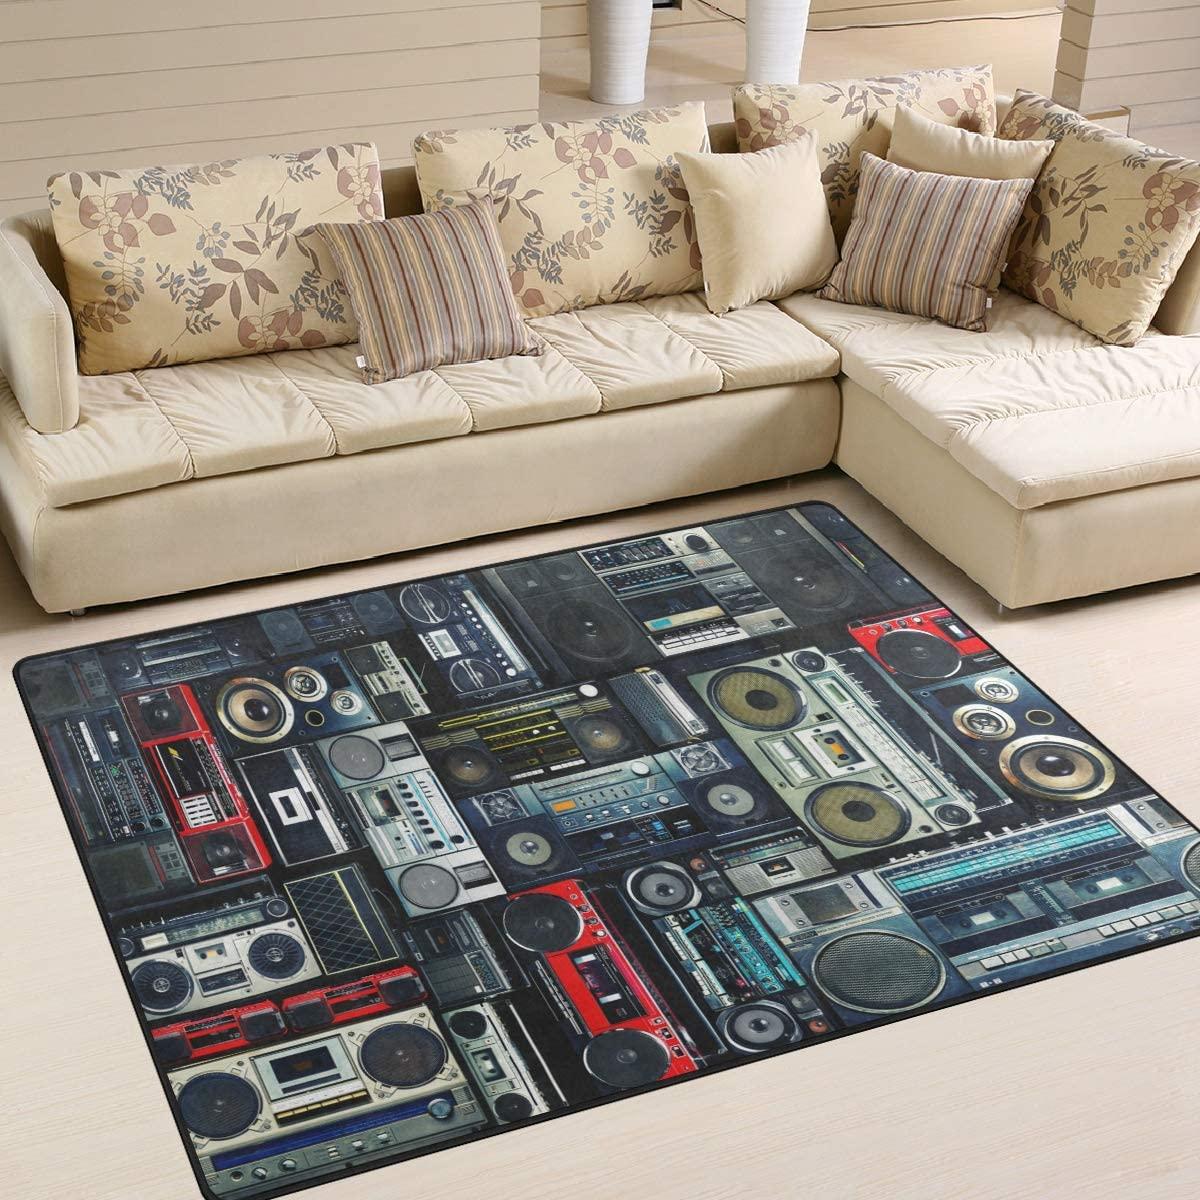 ALAZA Vintage Stylish Radio Boombox Music Area Rug Rugs for Living Room Bedroom 5'3